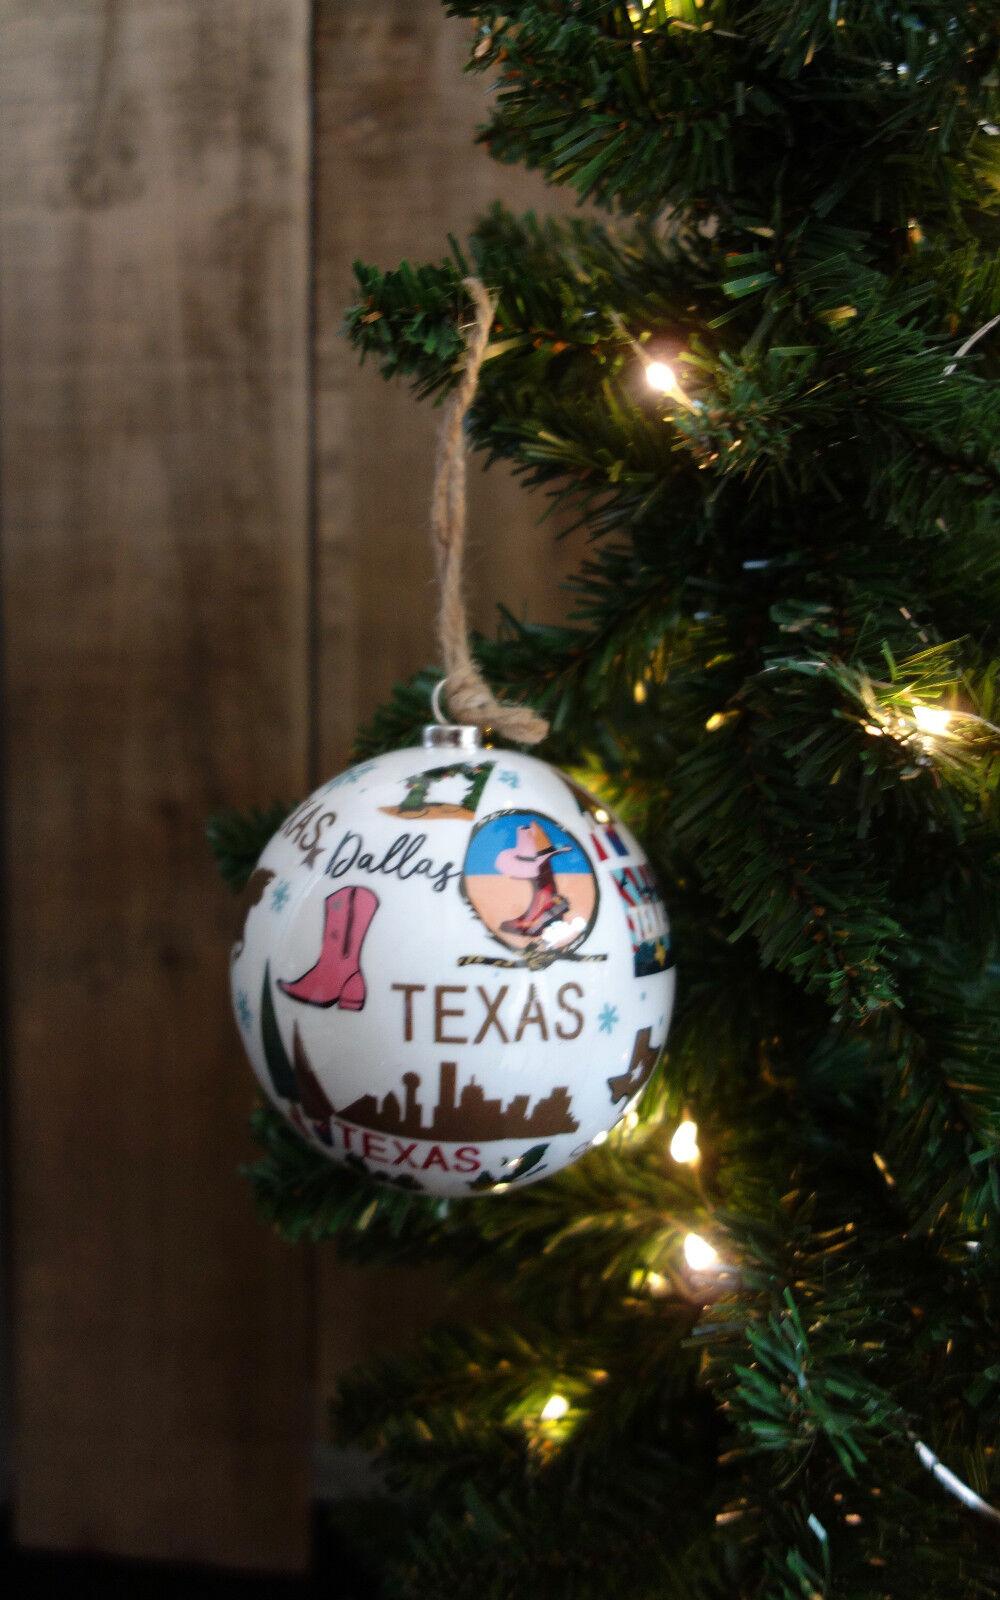 * Wow! Texas bola de árbol de Navidad de Adorno * Lindo *